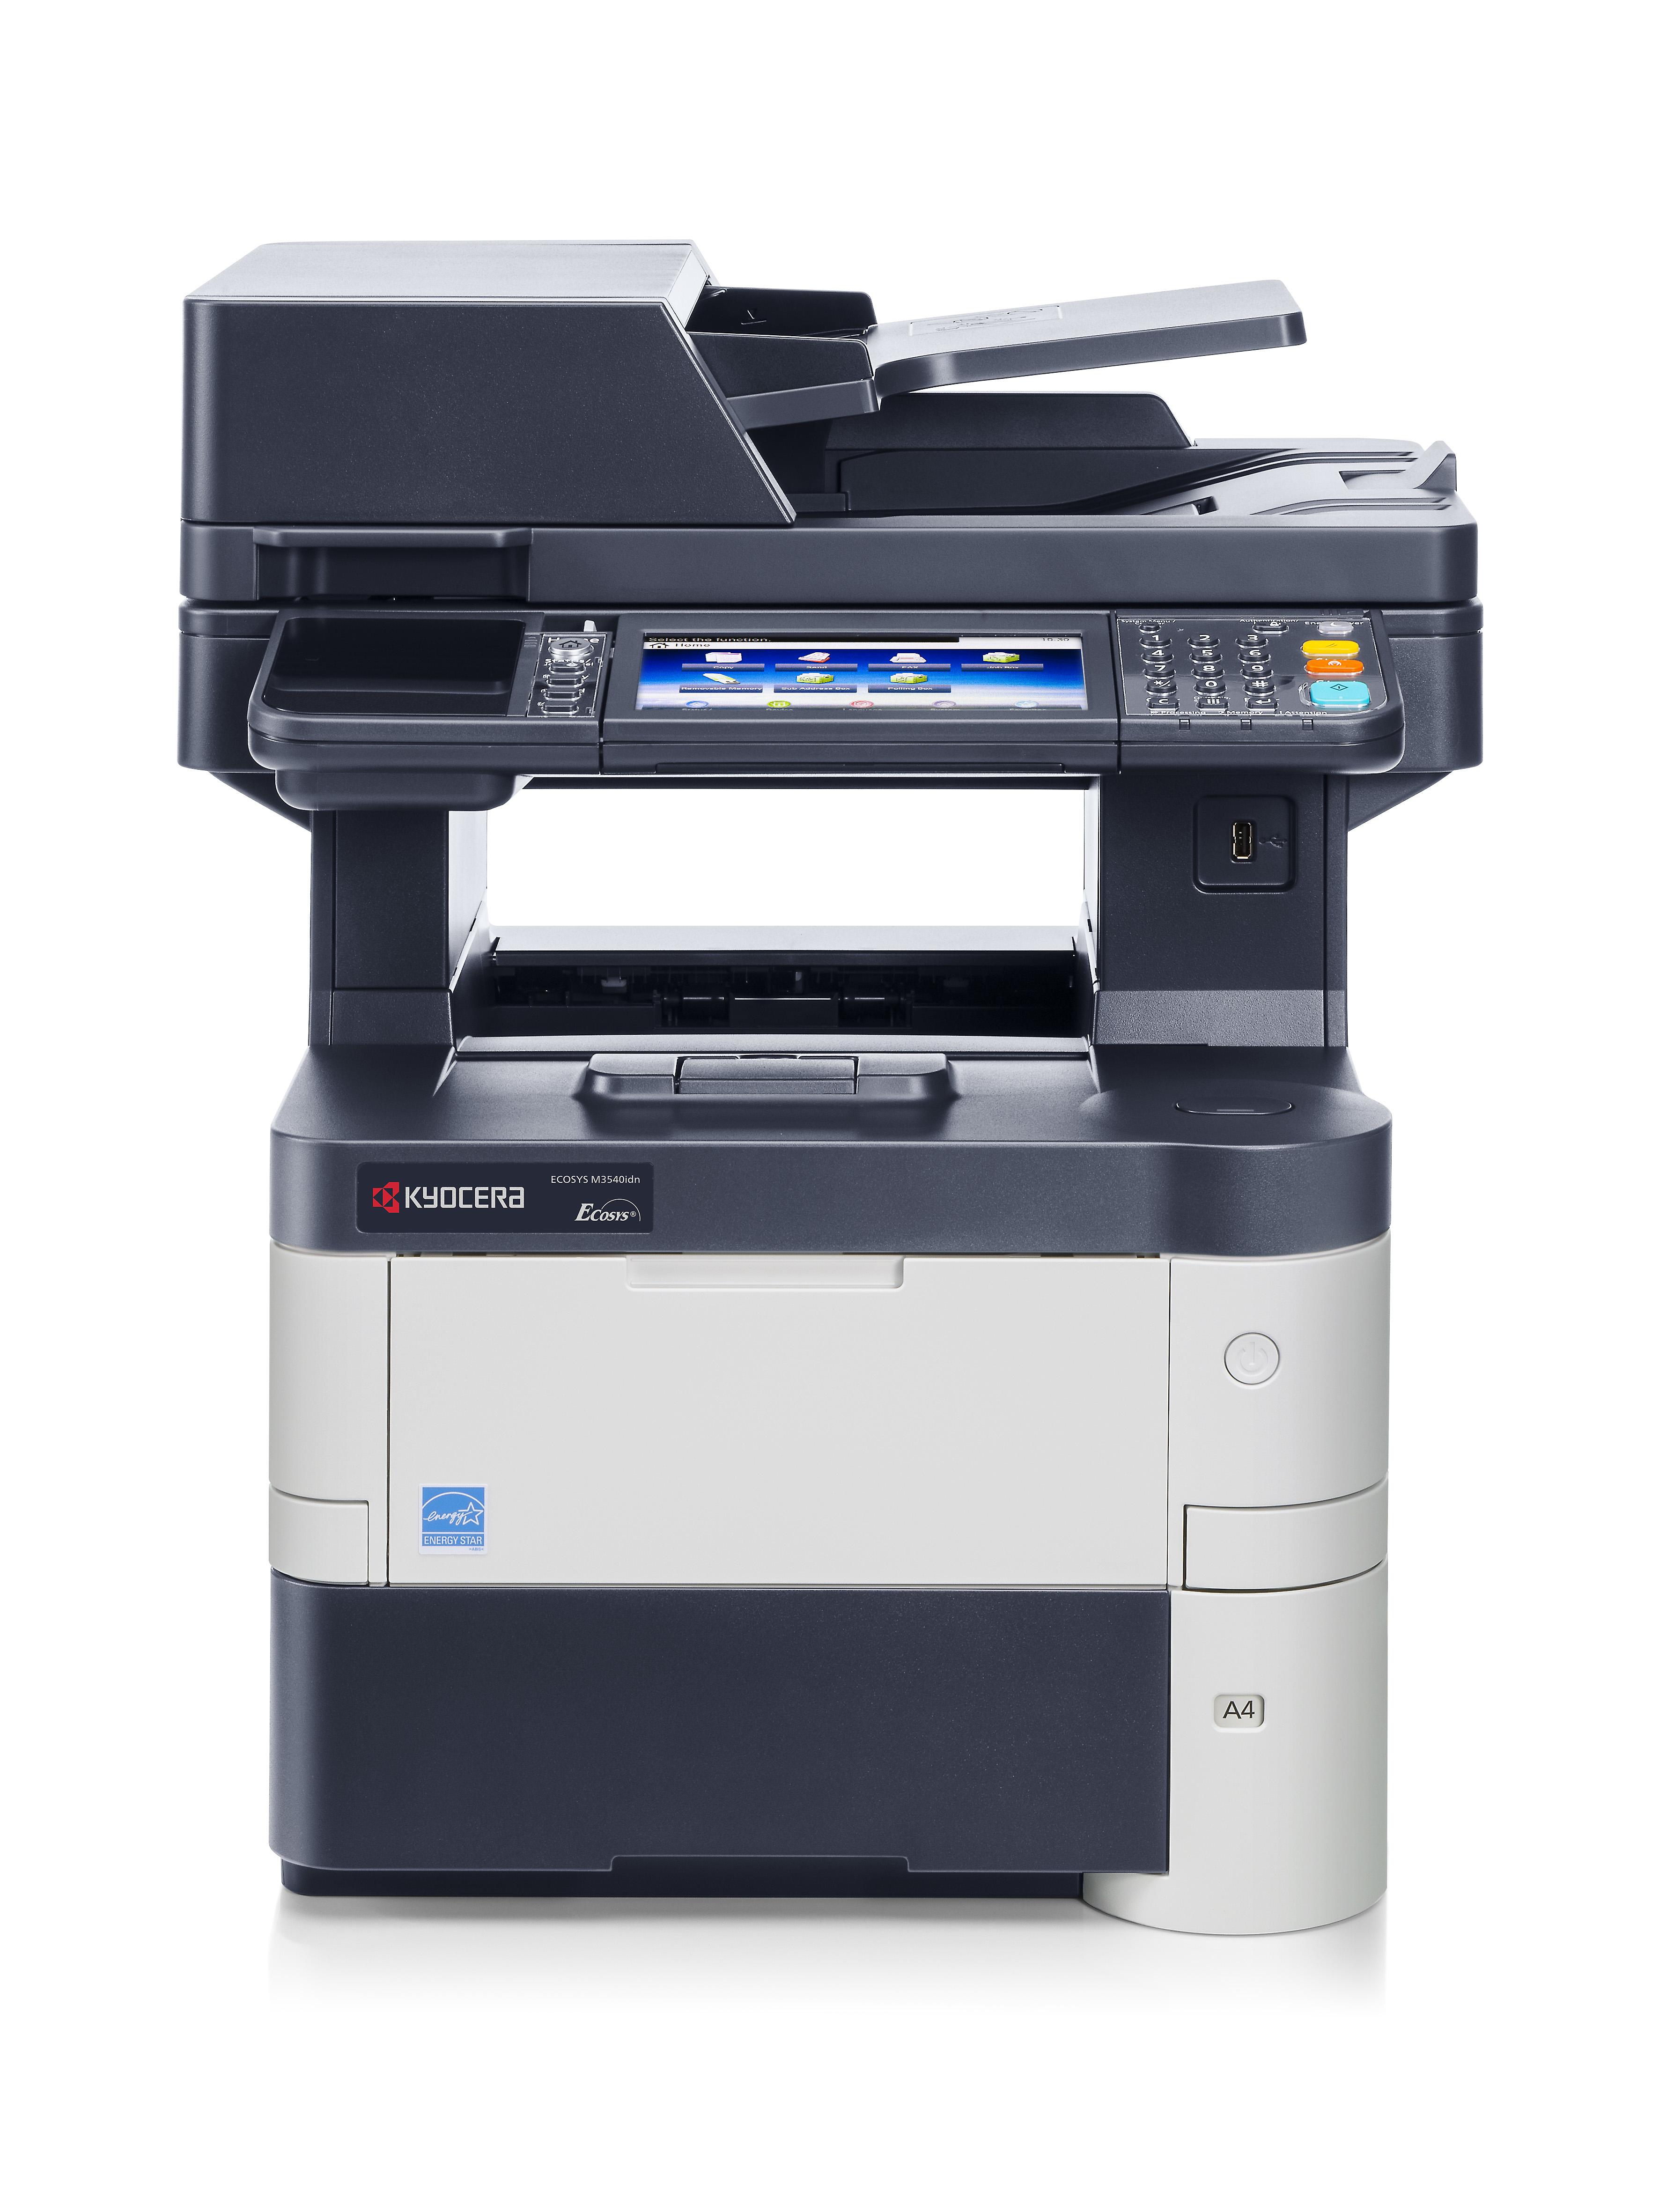 Kyocera ECOSYS M3540idn - Multifunktionsdrucker - s/w